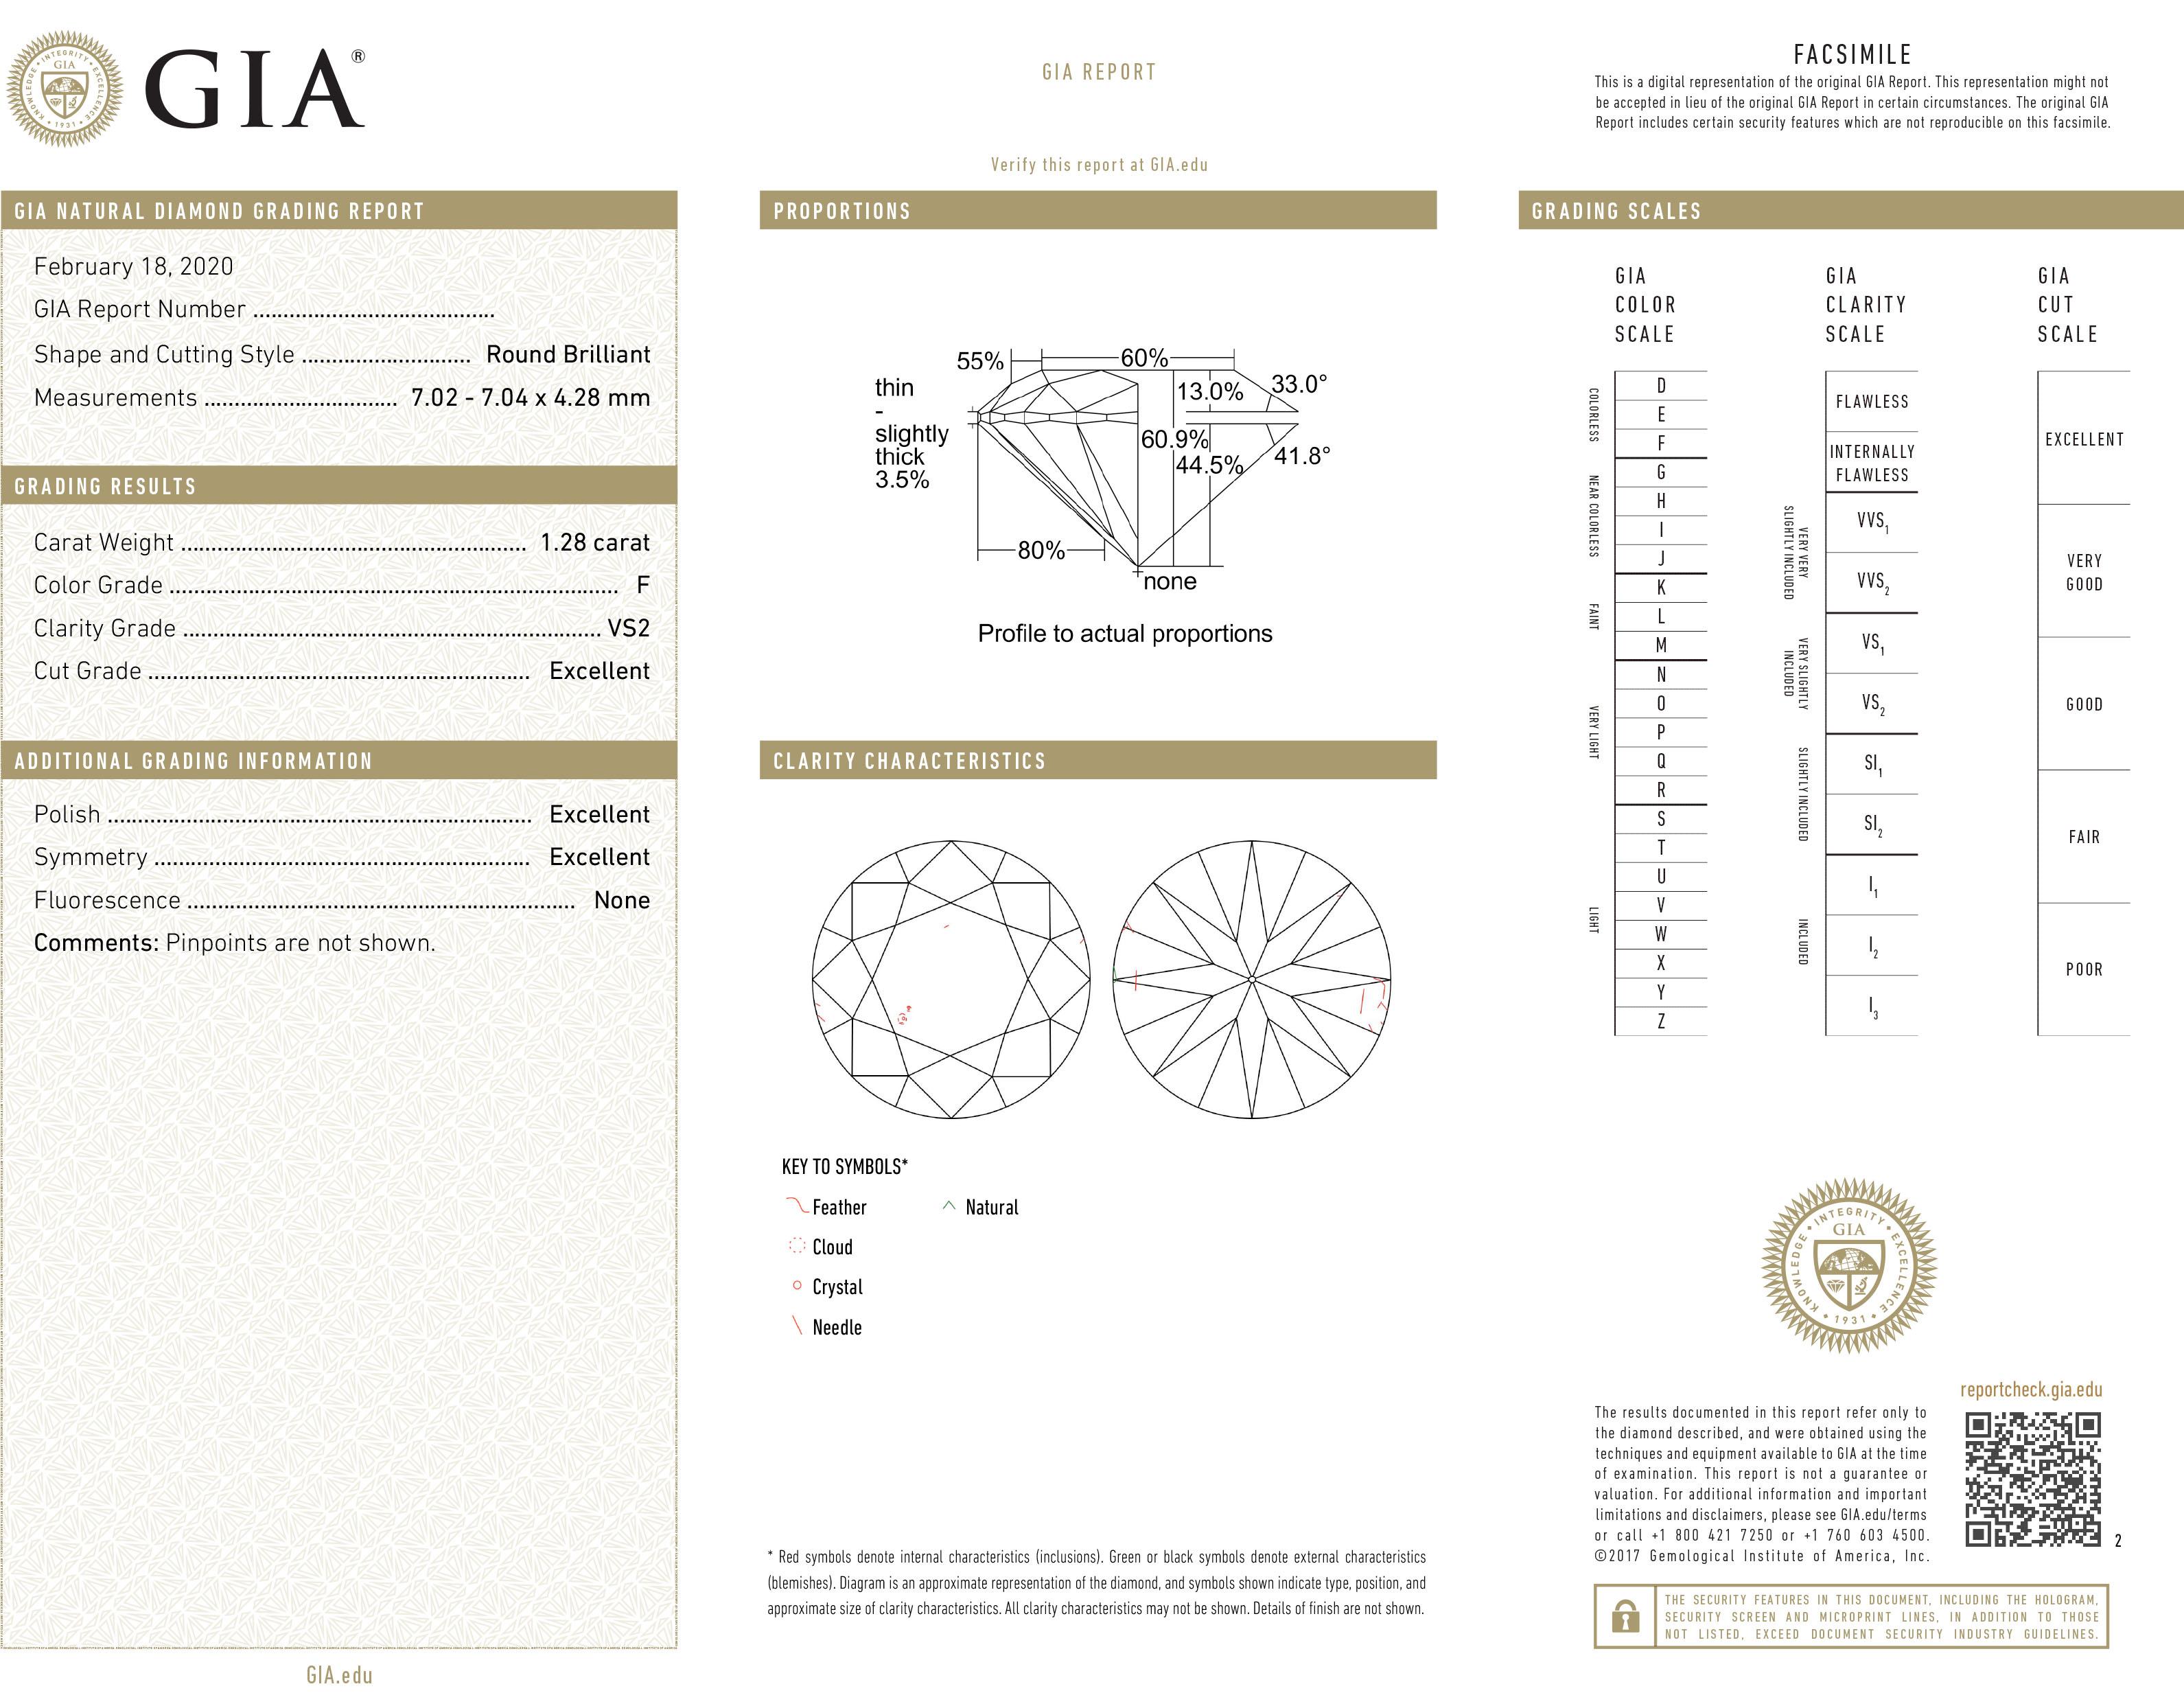 Kwiat Classic 3-Prong Round Diamond Solitaire Pendant, 1.25 Carat Diamond Size, F Color, VS2 Clarity in Platinum | Kwiat